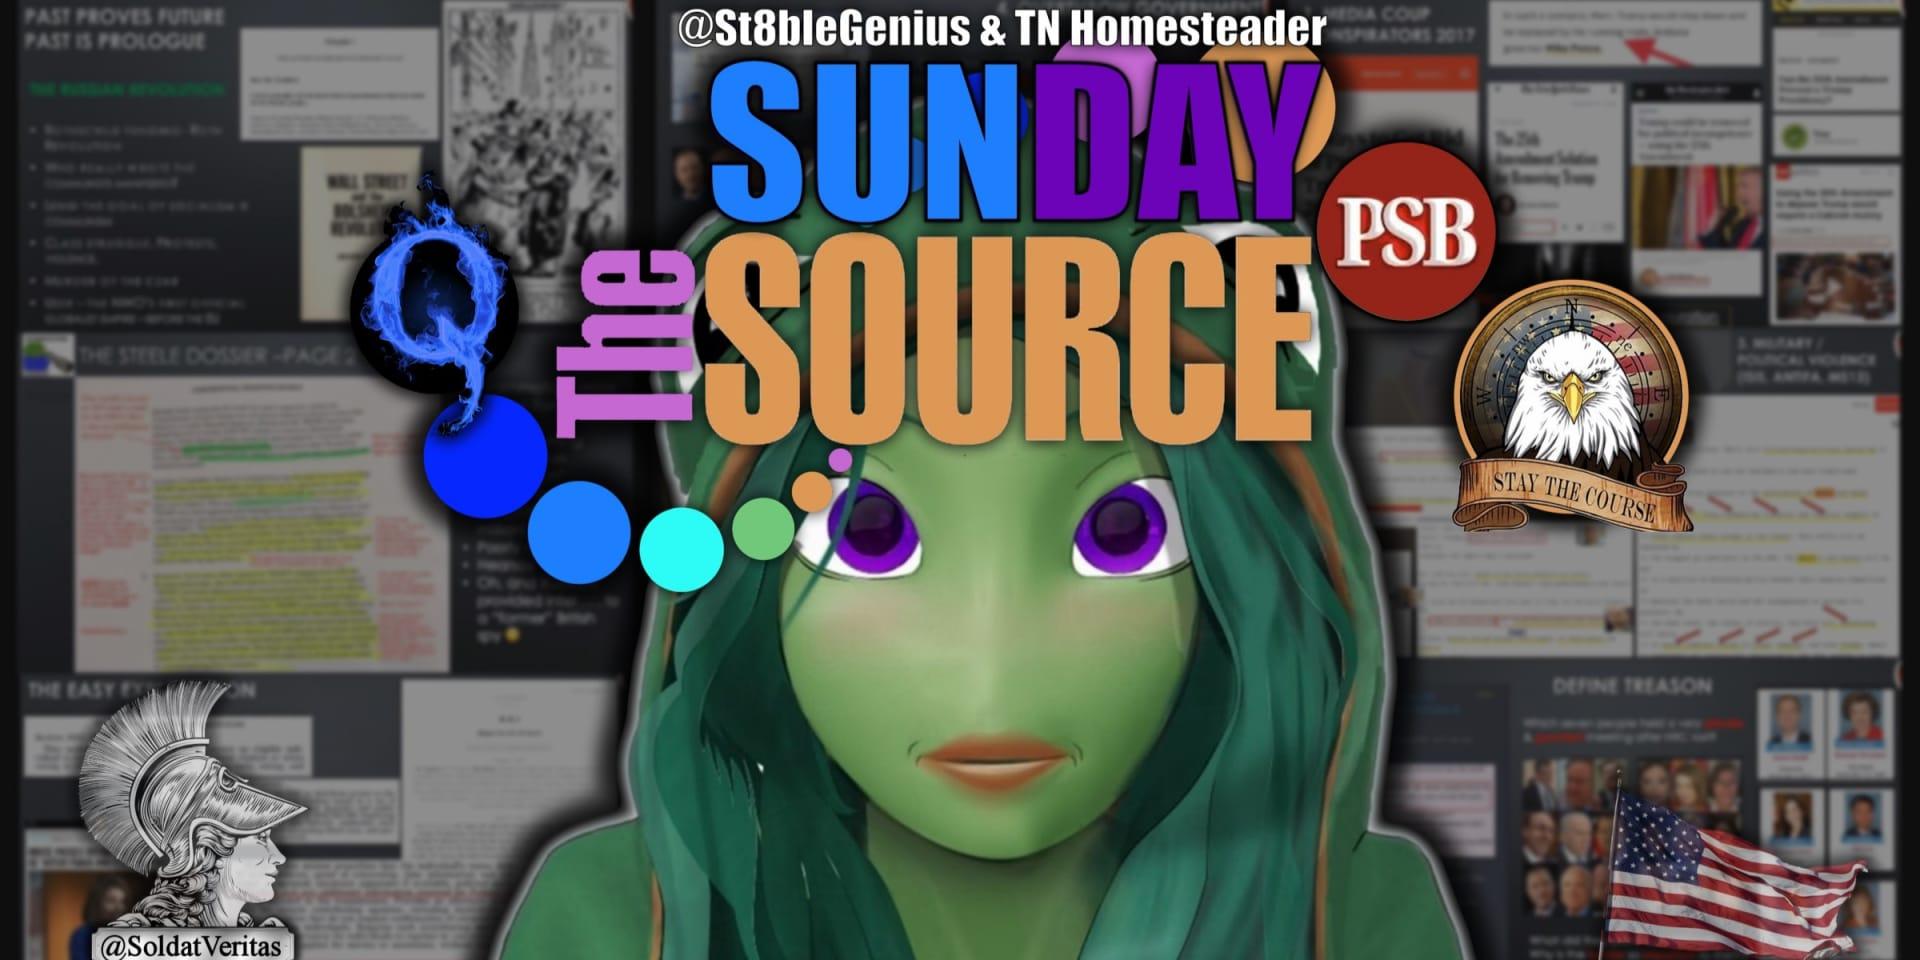 The Sunday Source  - St8ble Genius & TN Homesteader